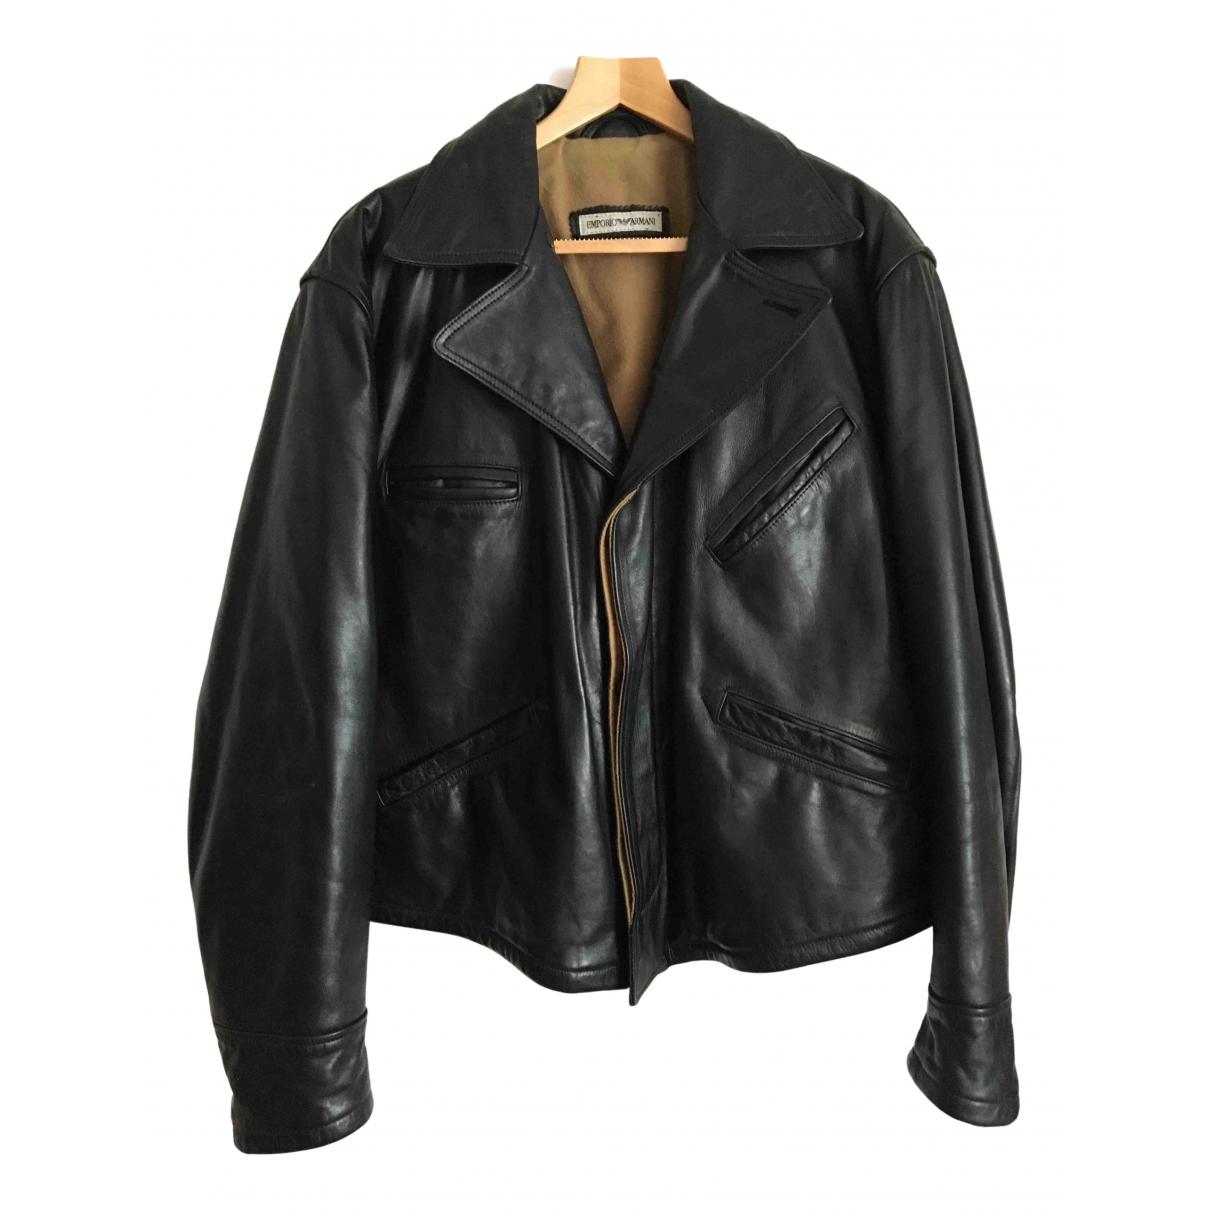 Emporio Armani \N Black Leather jacket  for Men 52 IT